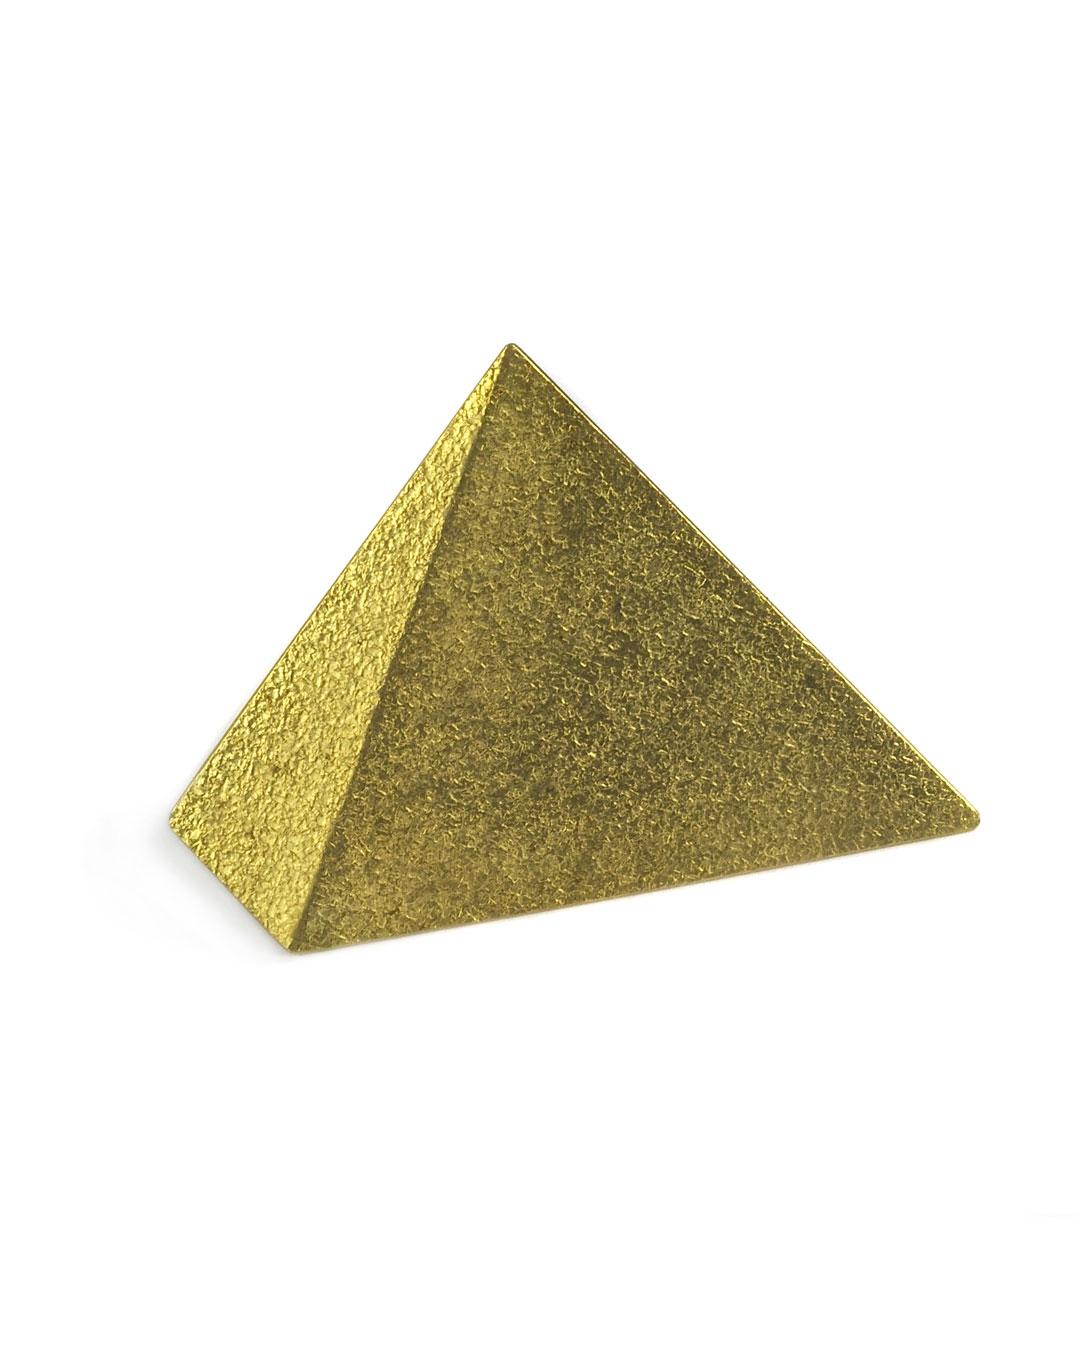 Okinari Kurokawa, untitled, 2007, brooch; 20ct gold, stainless steel, 52 x 40 x 3 mm, €1700